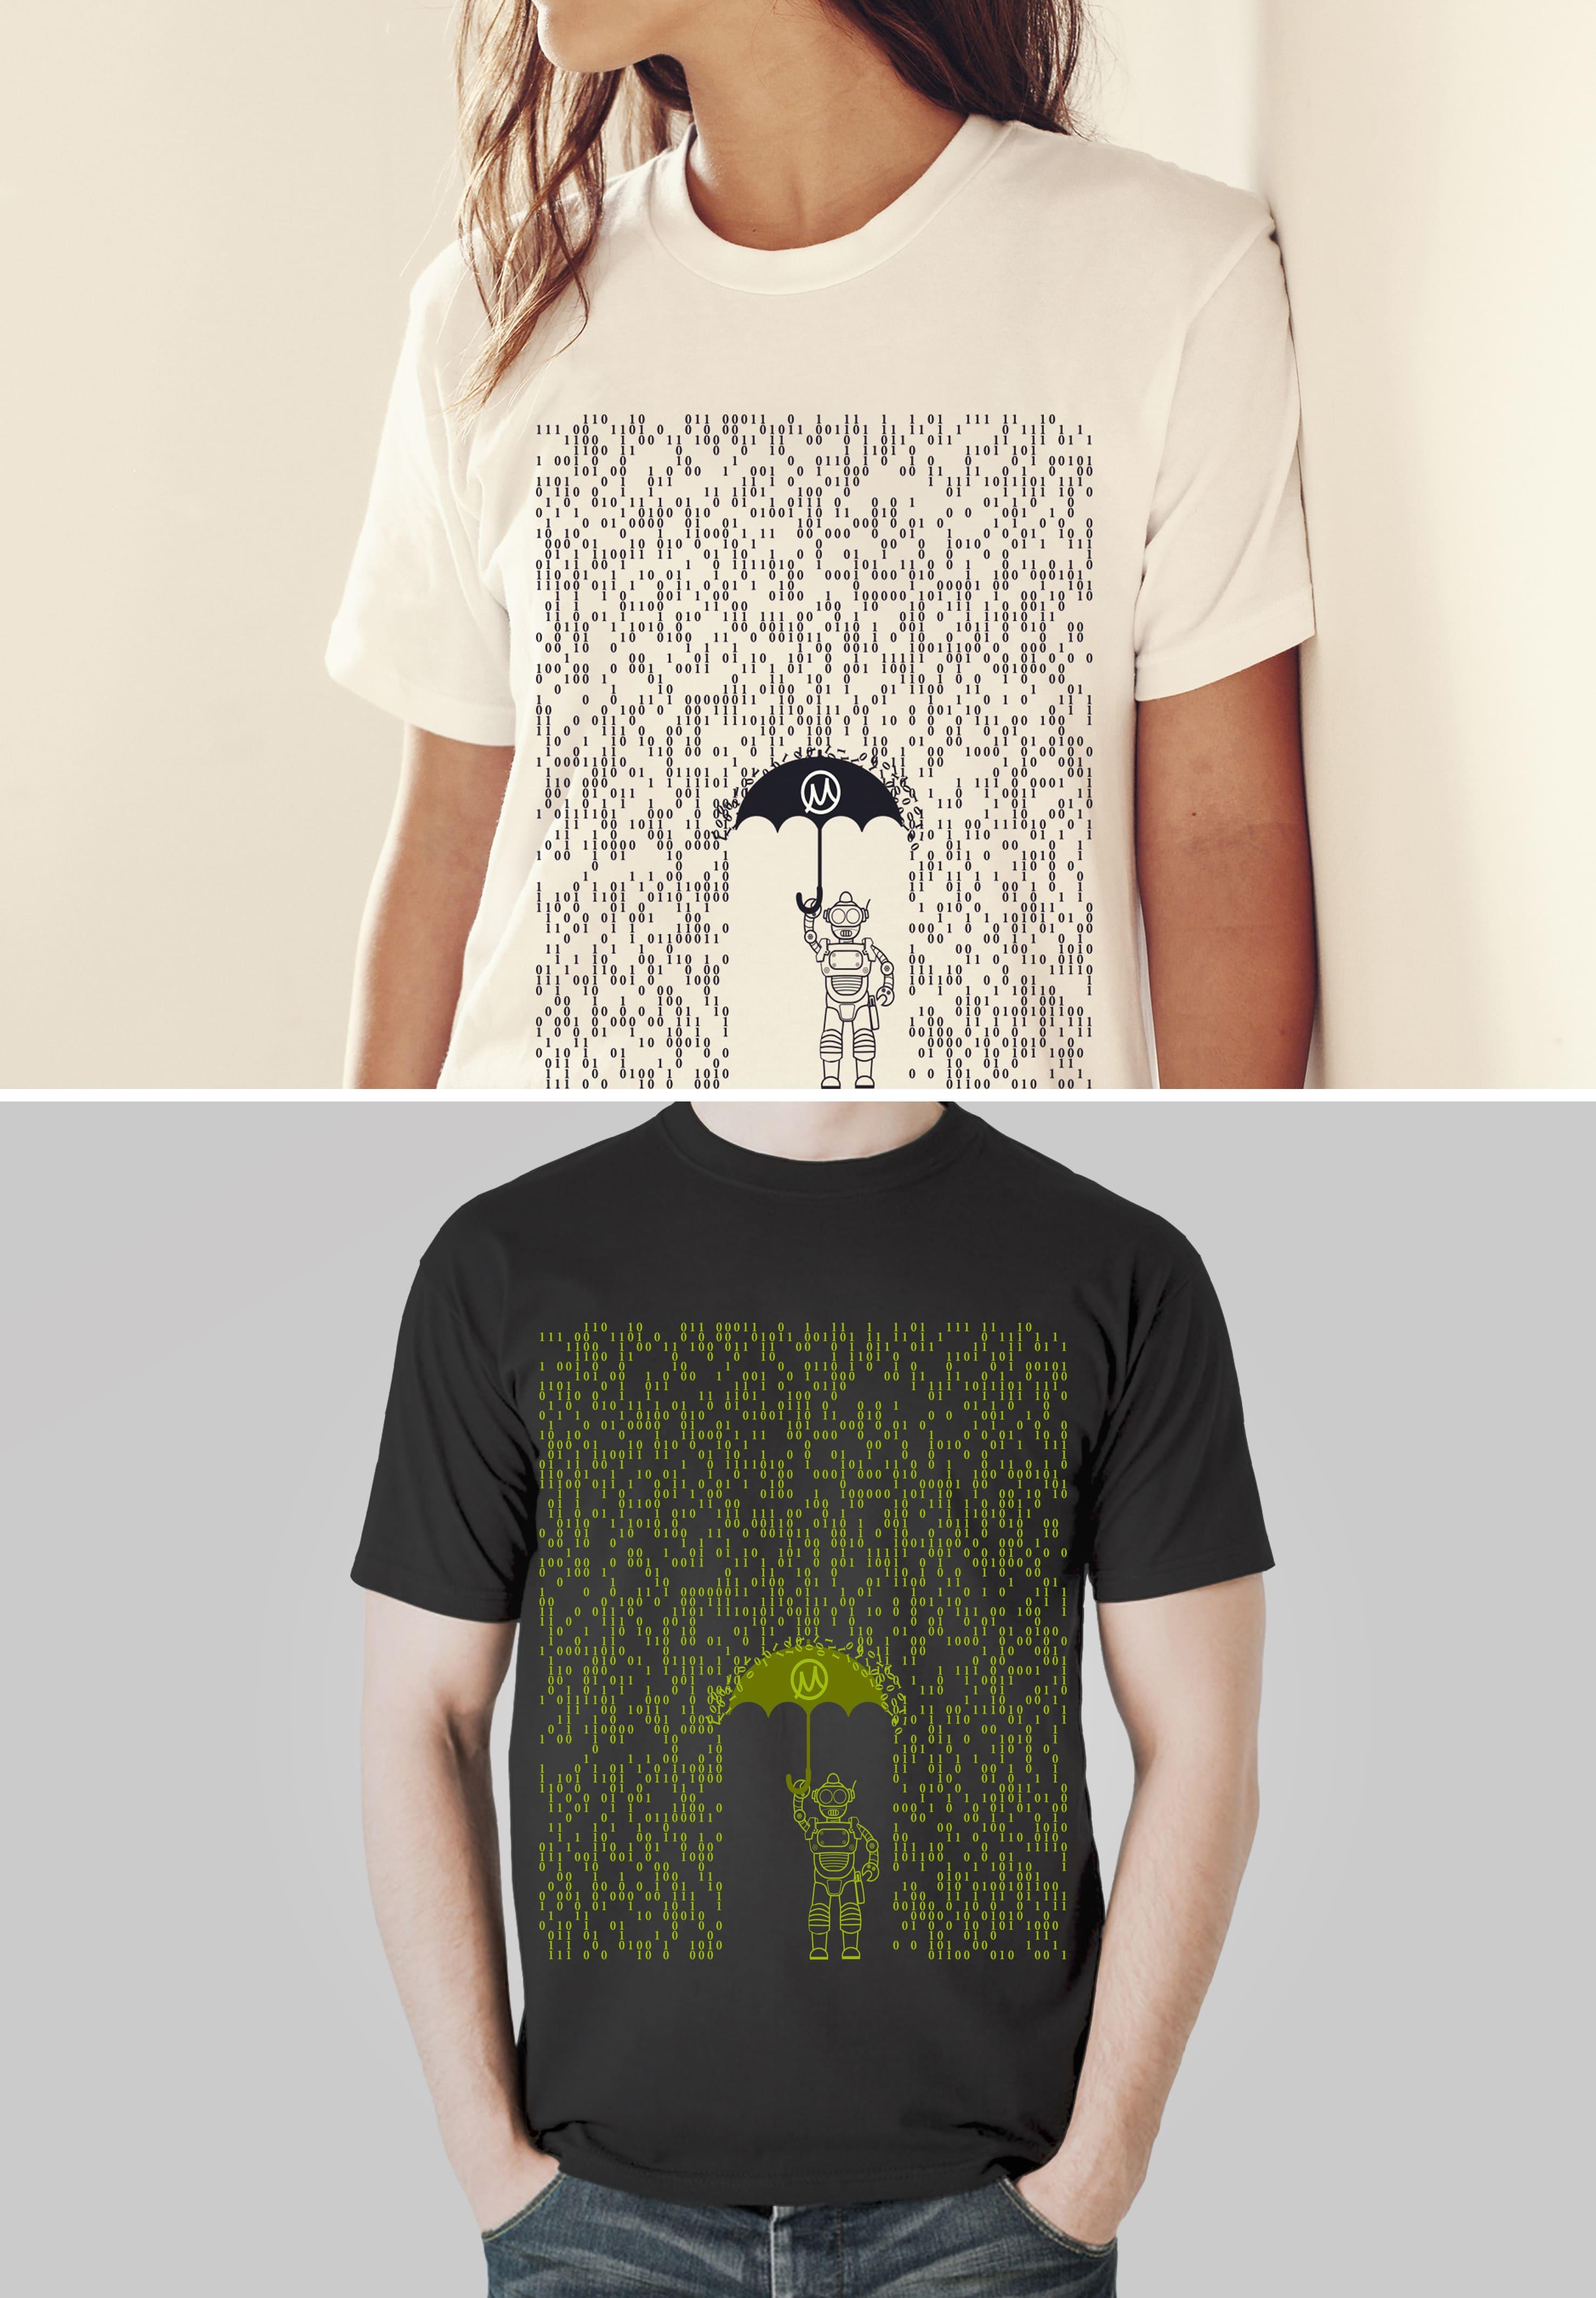 Нарисовать принты на футболки для компании Моторика фото f_96360a63db1304ed.jpg